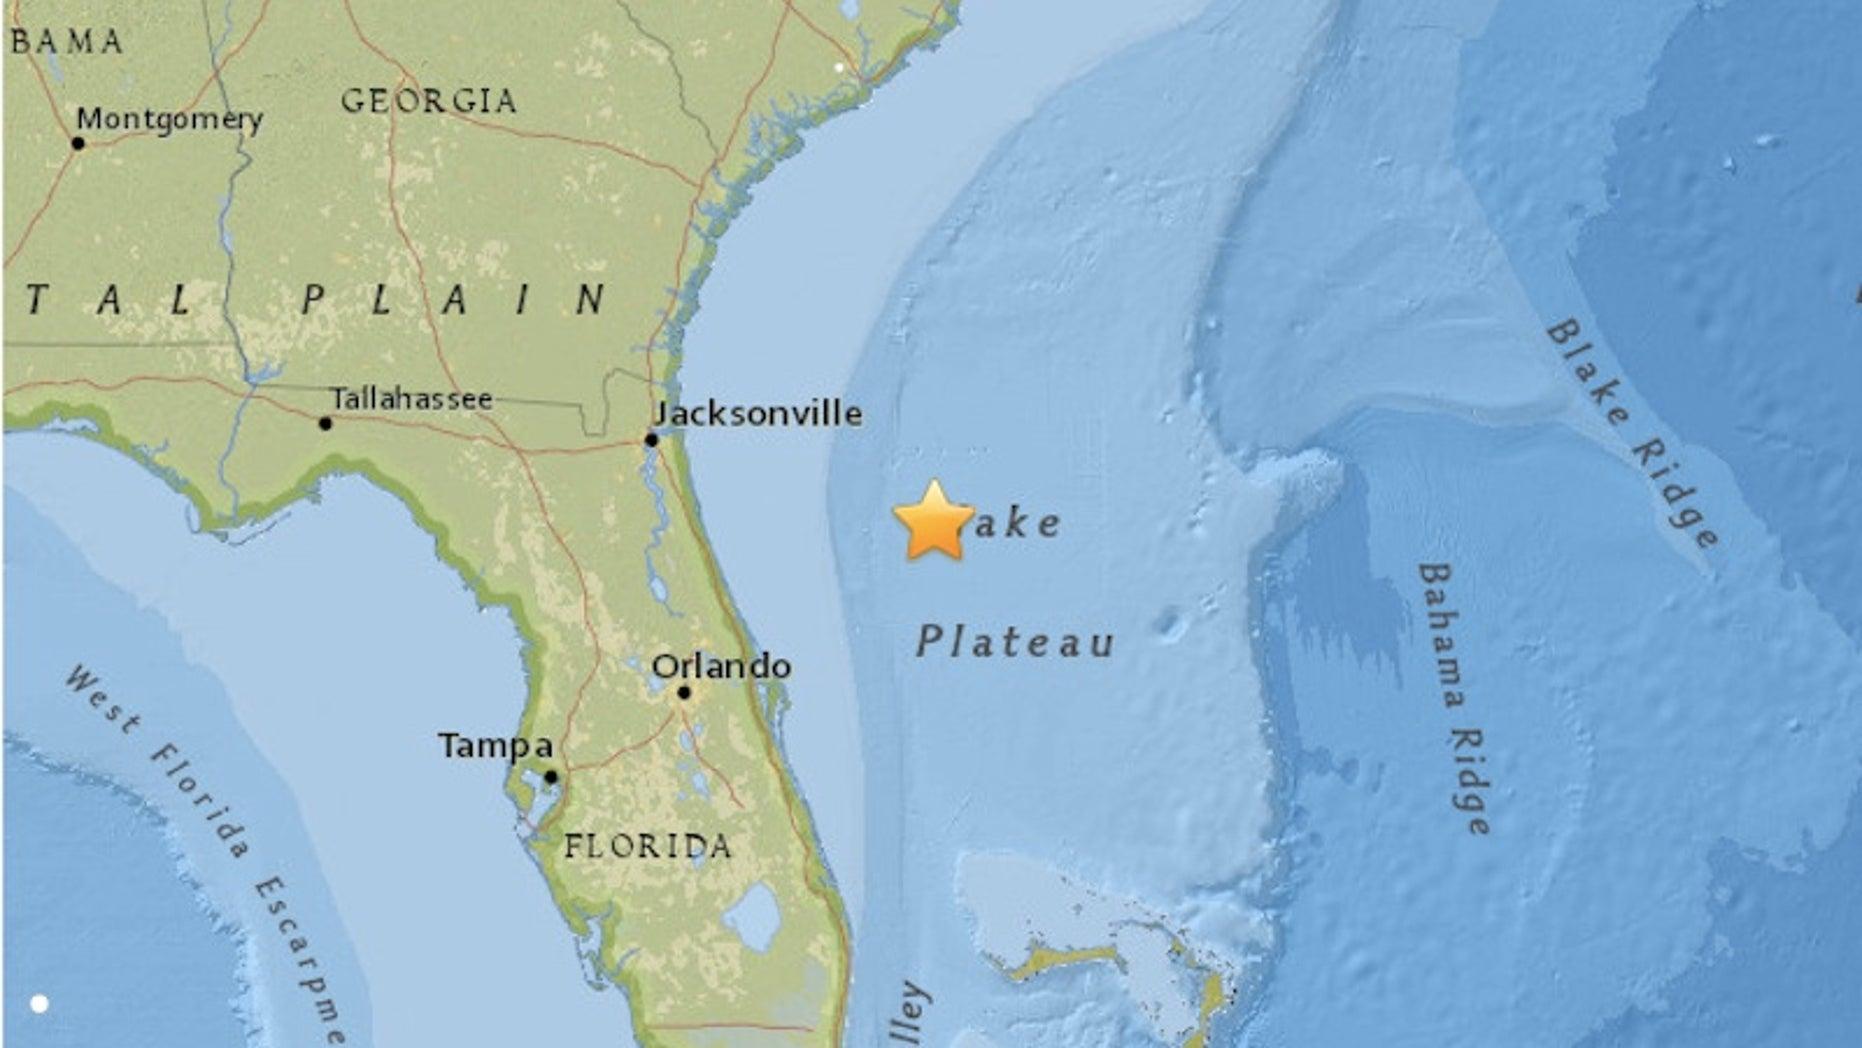 A 3.7-magnitude earthquake struck off the coast of Florida on July 16, 2016.